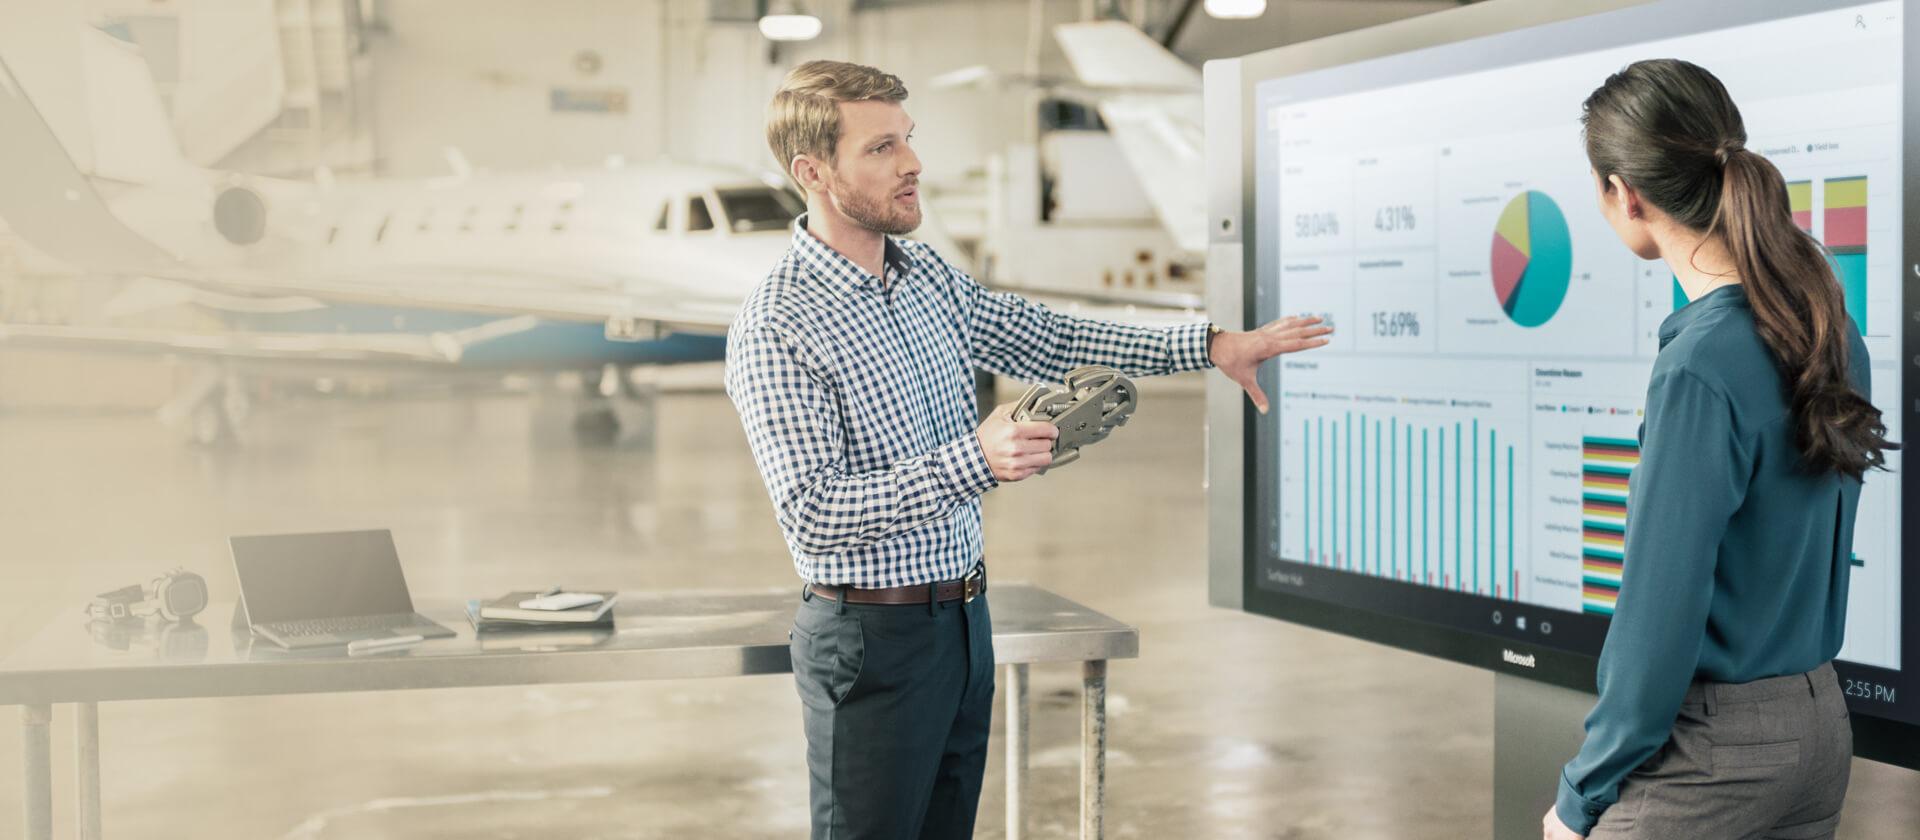 Introducing Microsoft Surface Hub - Agile Collaborative Working